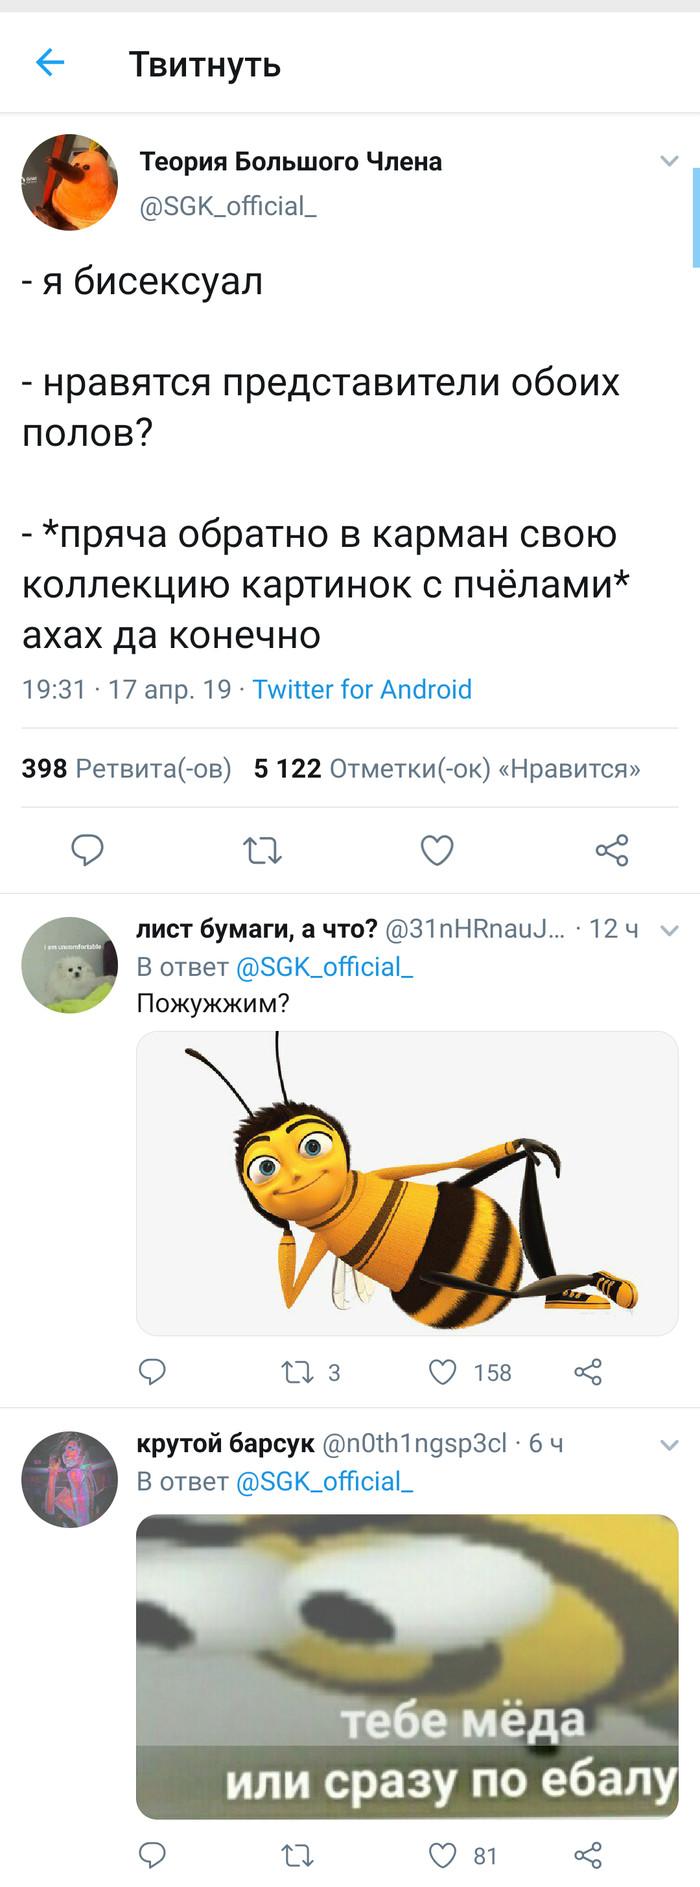 Твиттерское Скриншот, Twitter, Пчелы, Длиннопост, Мат